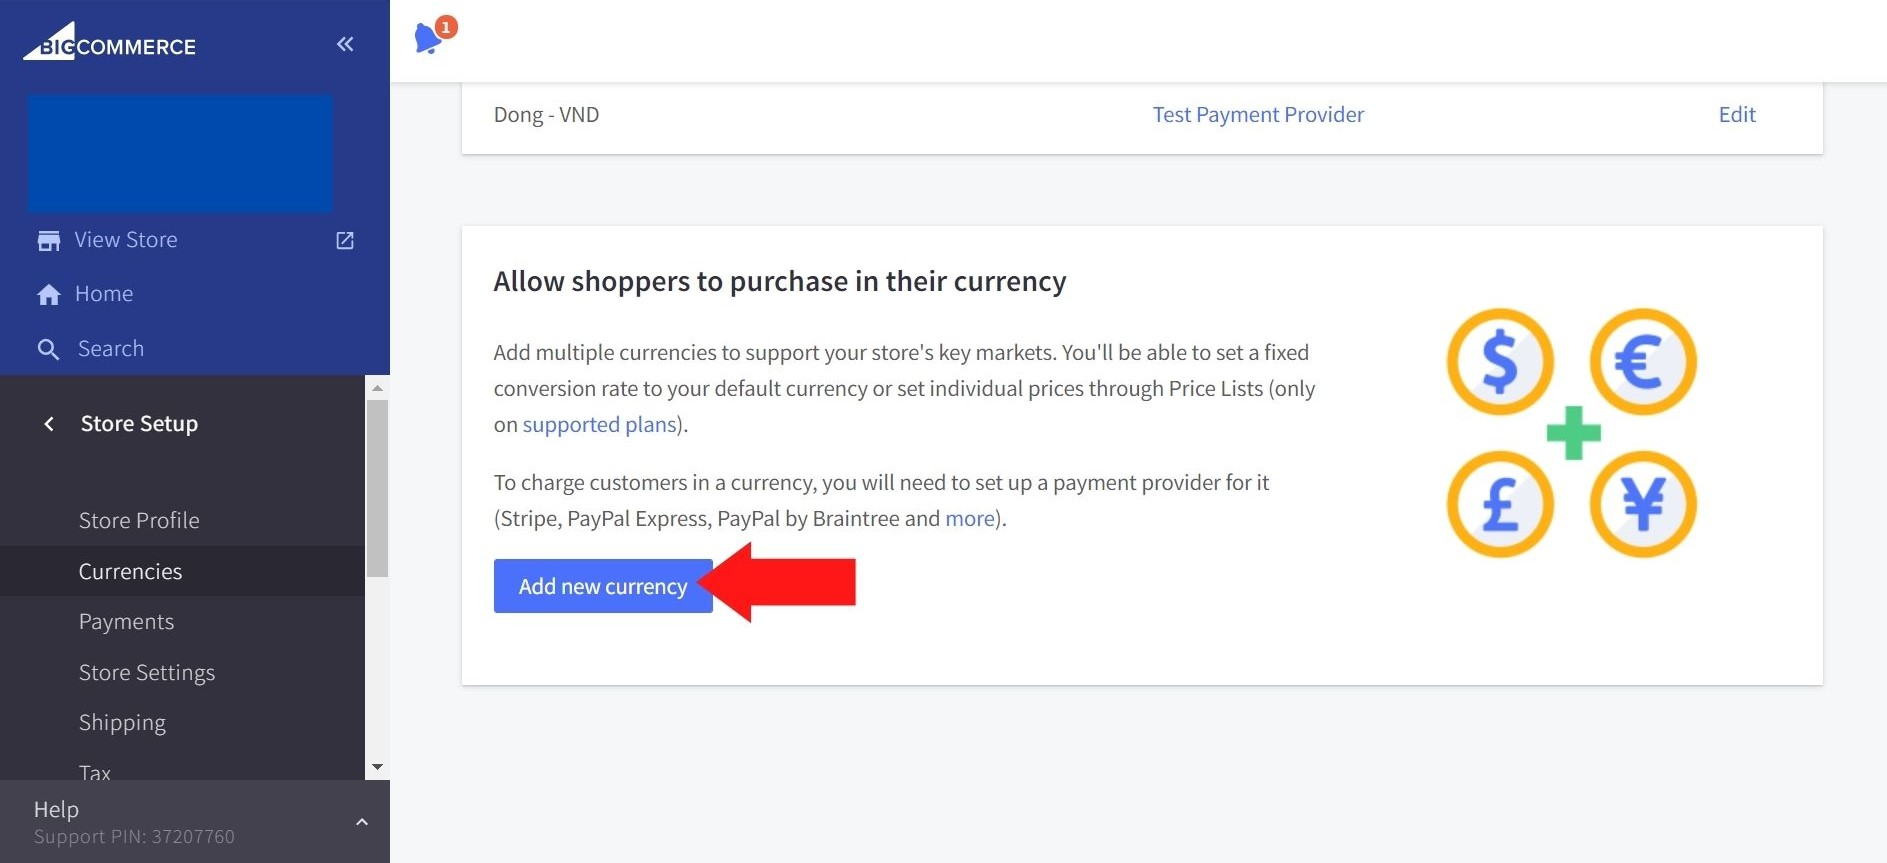 Adding currencies